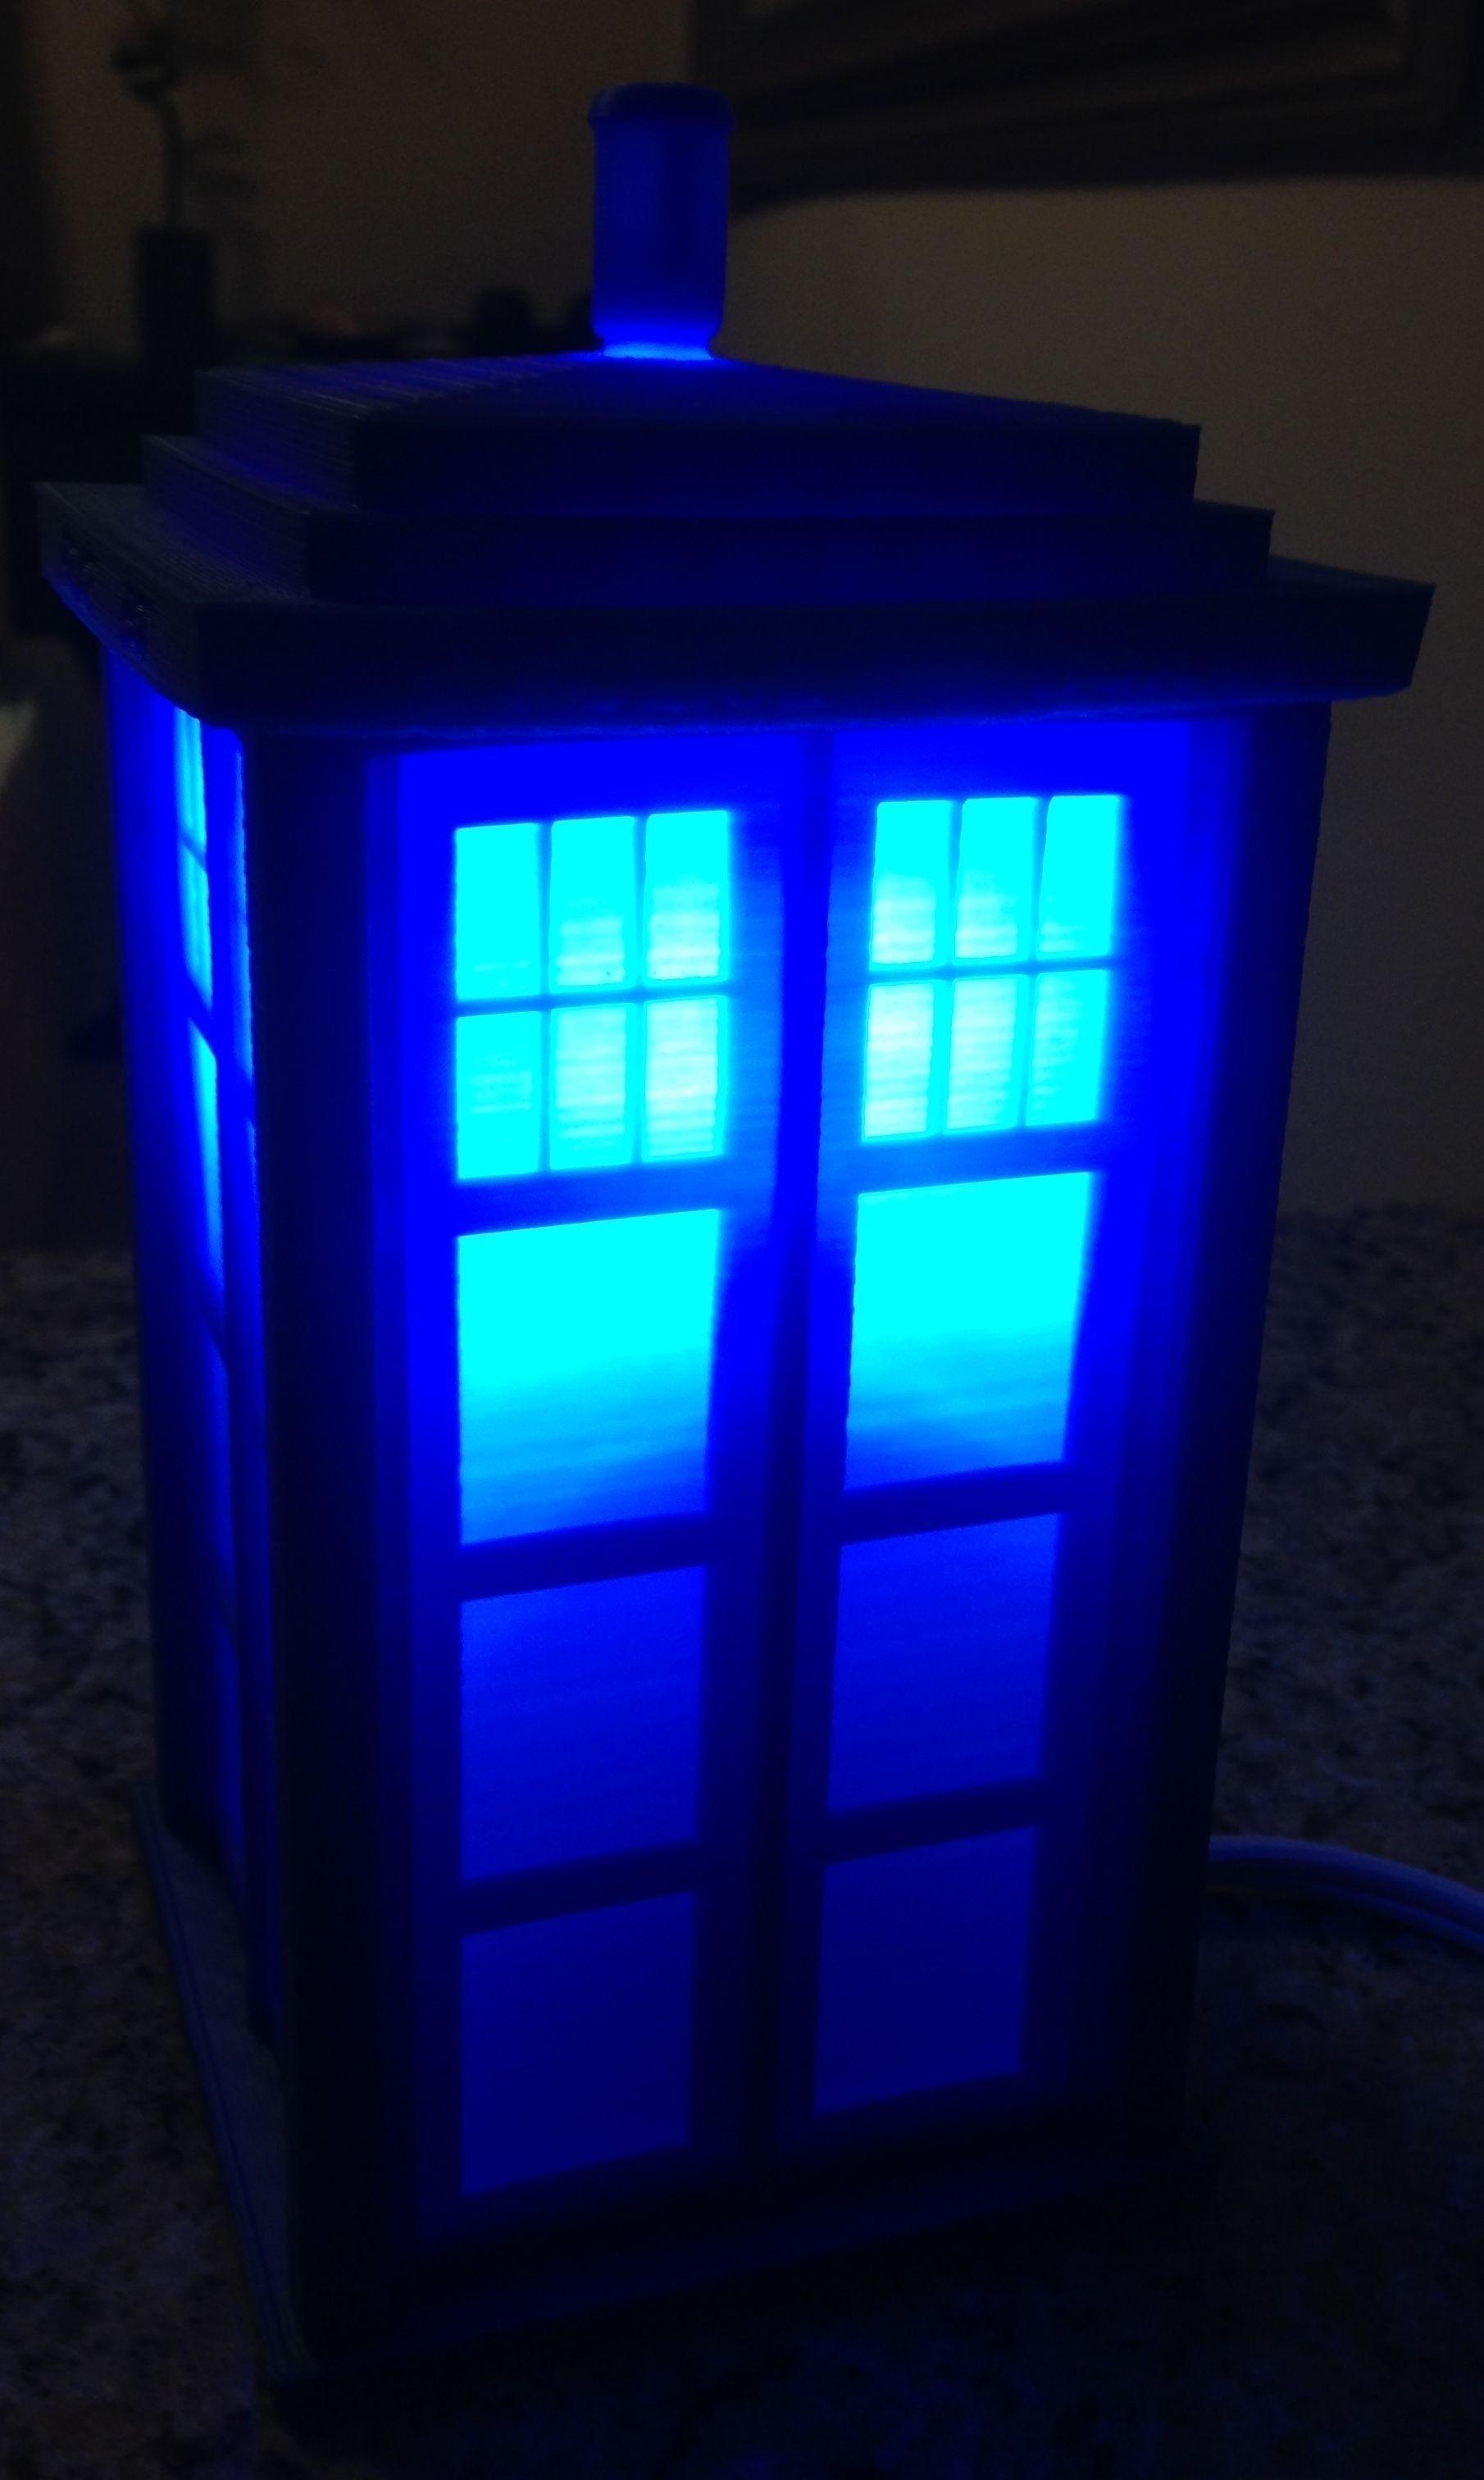 TARDIS Lamp or Circa 1960s London Police Call Box 3D model 3D ...